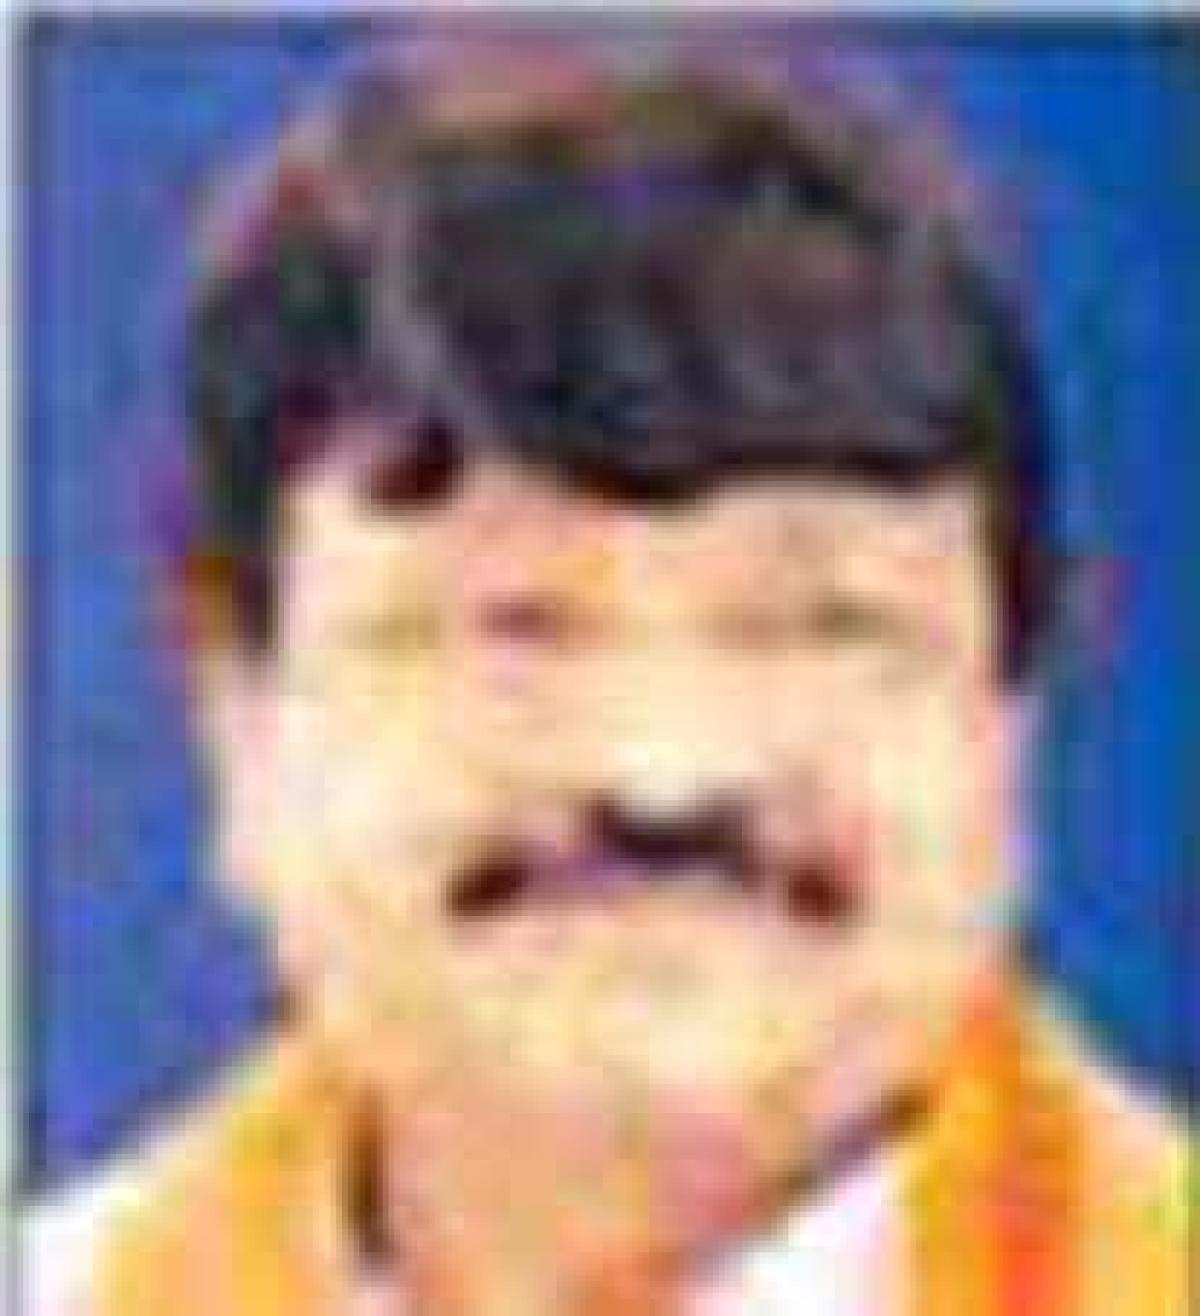 Another complaint against Vijayvargiya